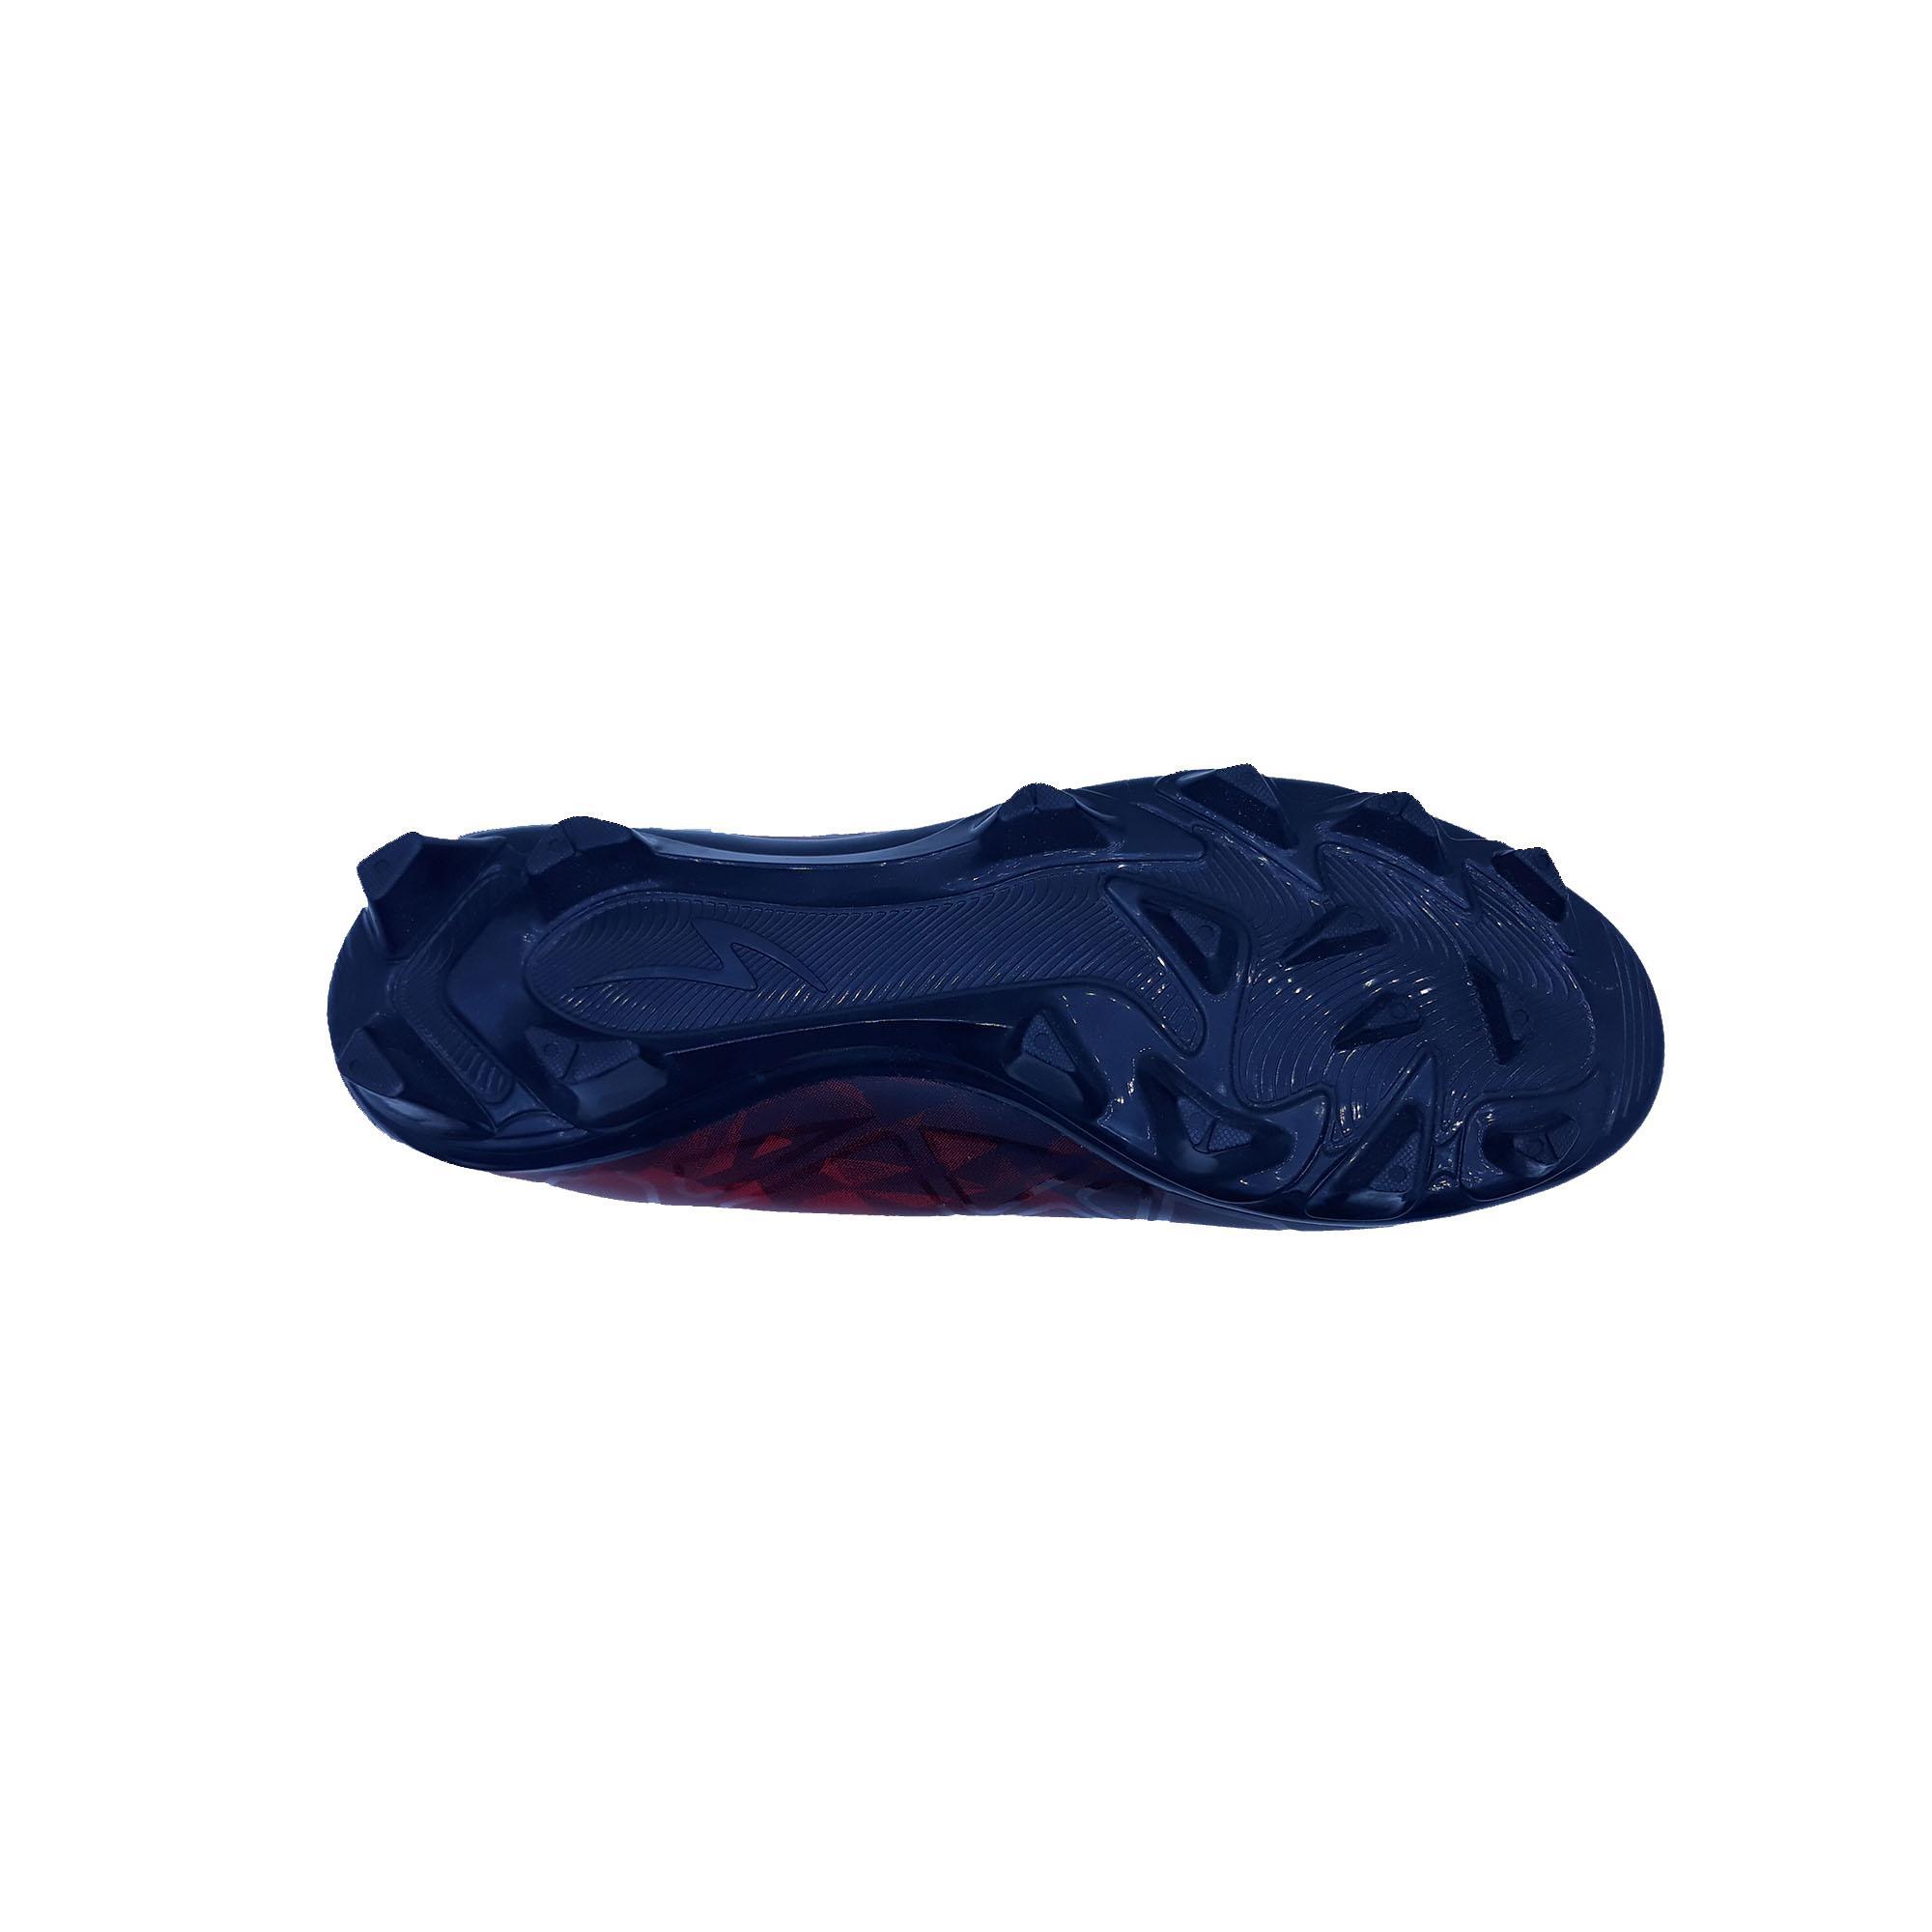 SPECS QUARK FG GALAXY BLUE CYRUS BLUE BLACK